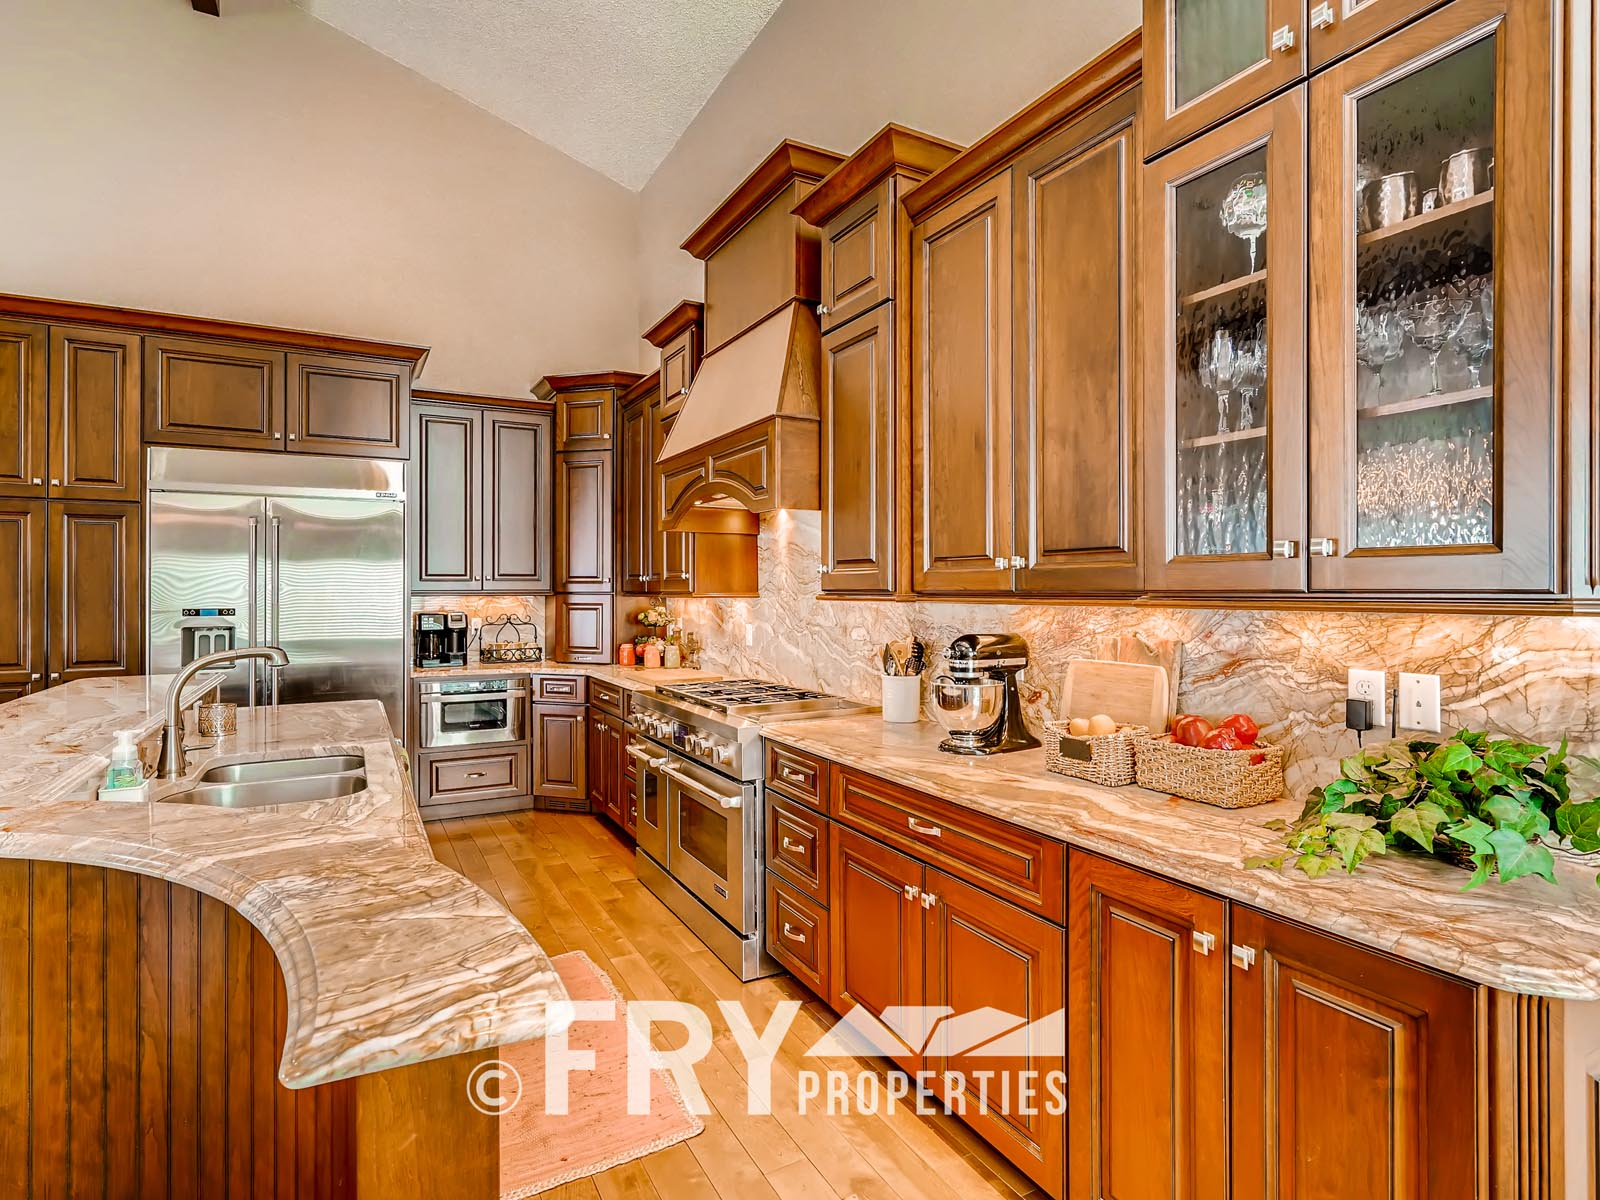 6305 W 6th Ave Unit A6-print-010-7-Kitchen-3600x2400-300dpi